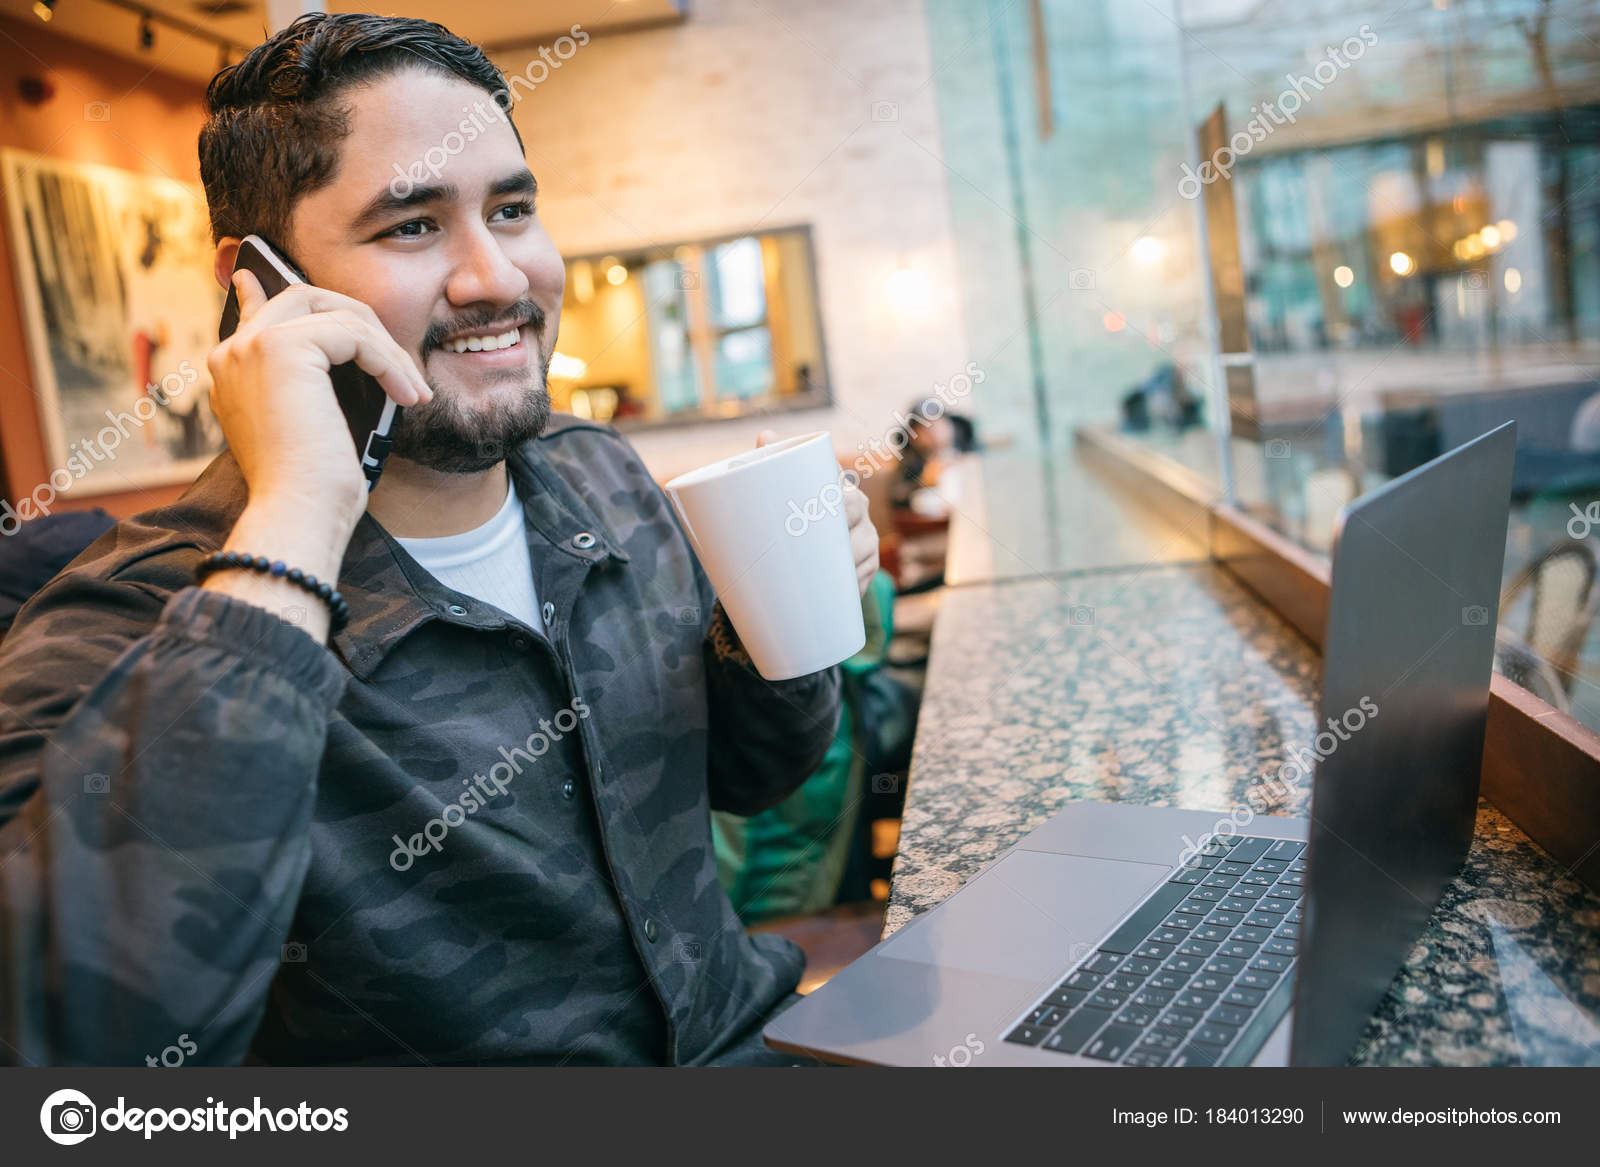 Online dating μετά τη διάλυση